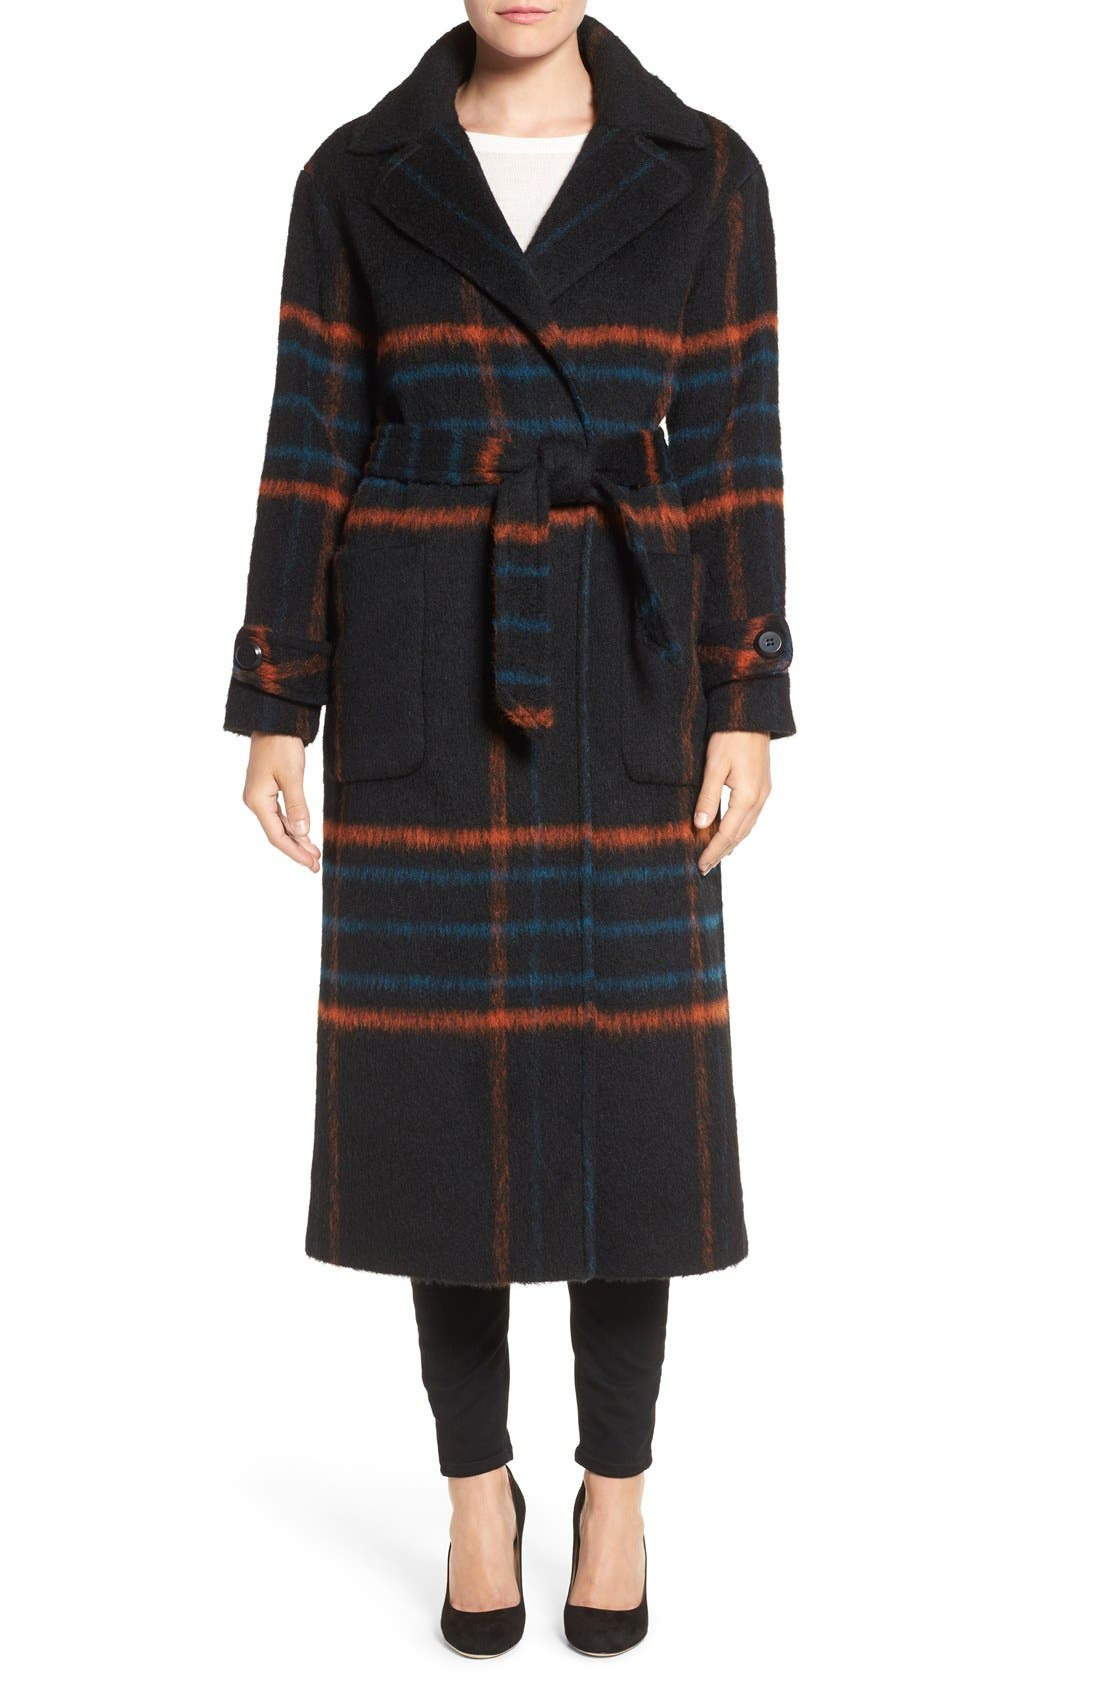 Alternate Image 1 Selected - Trina Turk 'Margaret' Check Wrap Coat